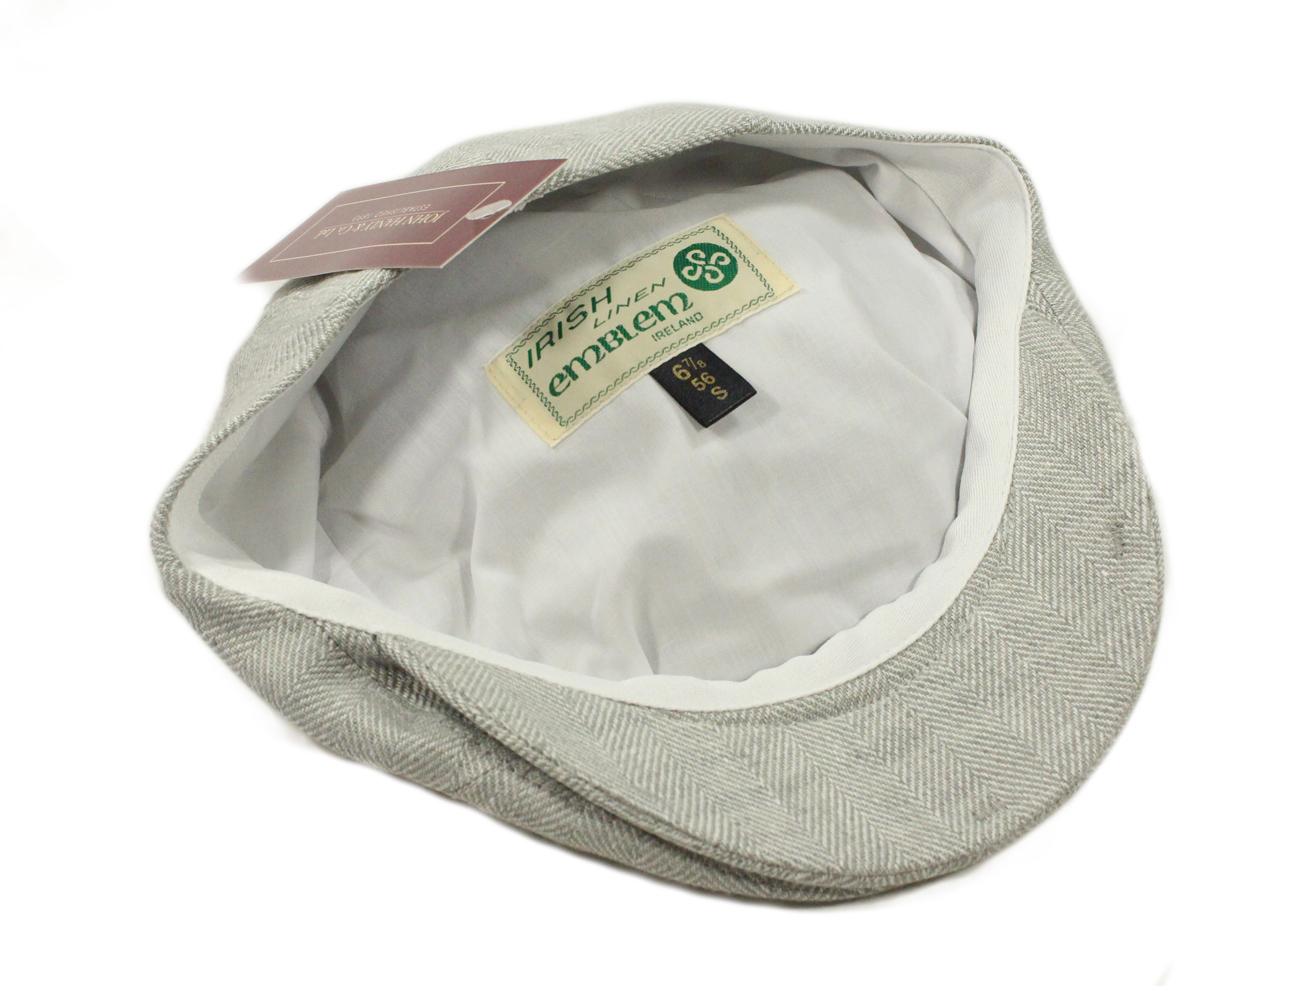 b4e4e458d0973 New Mens Summer Hat Irish Linen Made in Ireland John Hanly & Co. | eBay